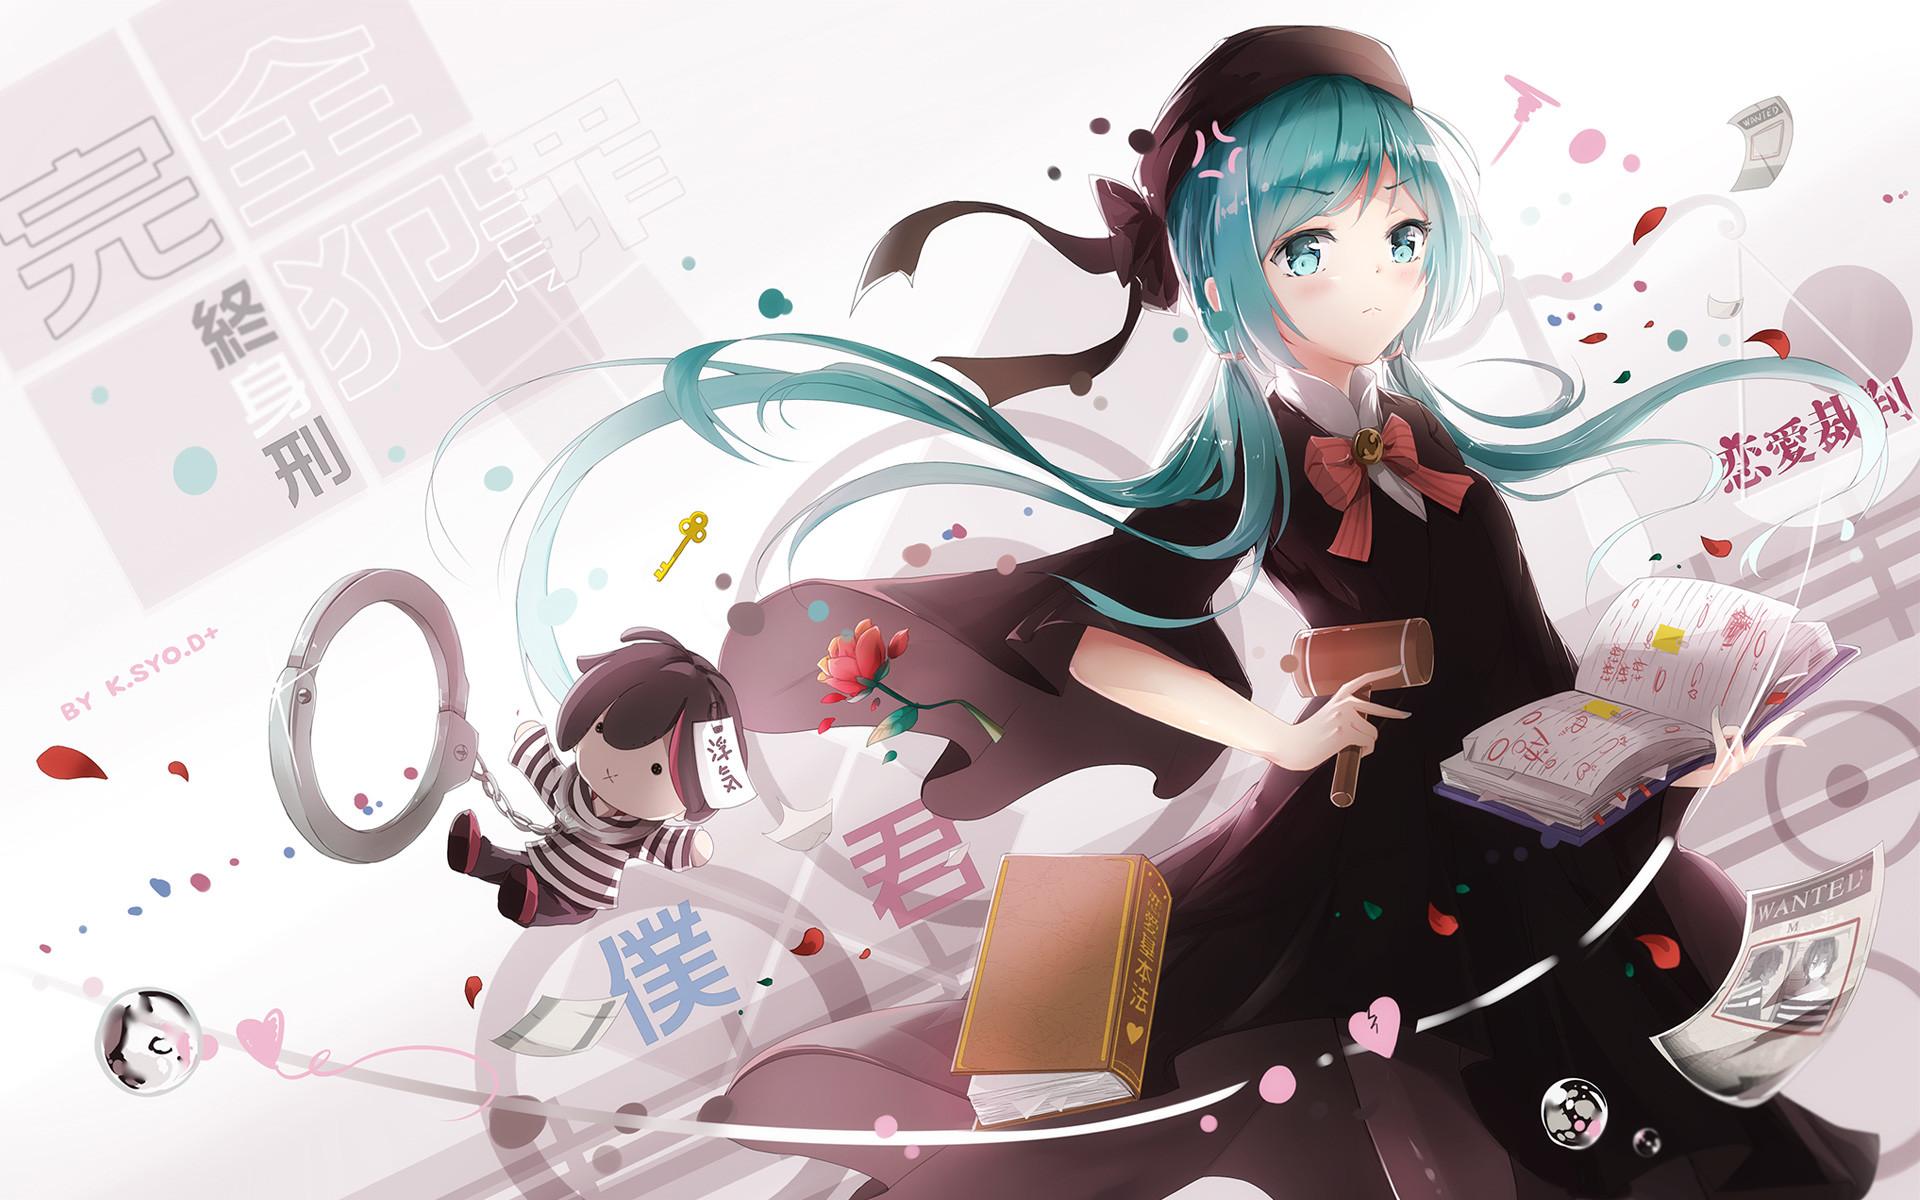 Vocaloid 5 download free | YAMAHA VOCALOID5 Libraries